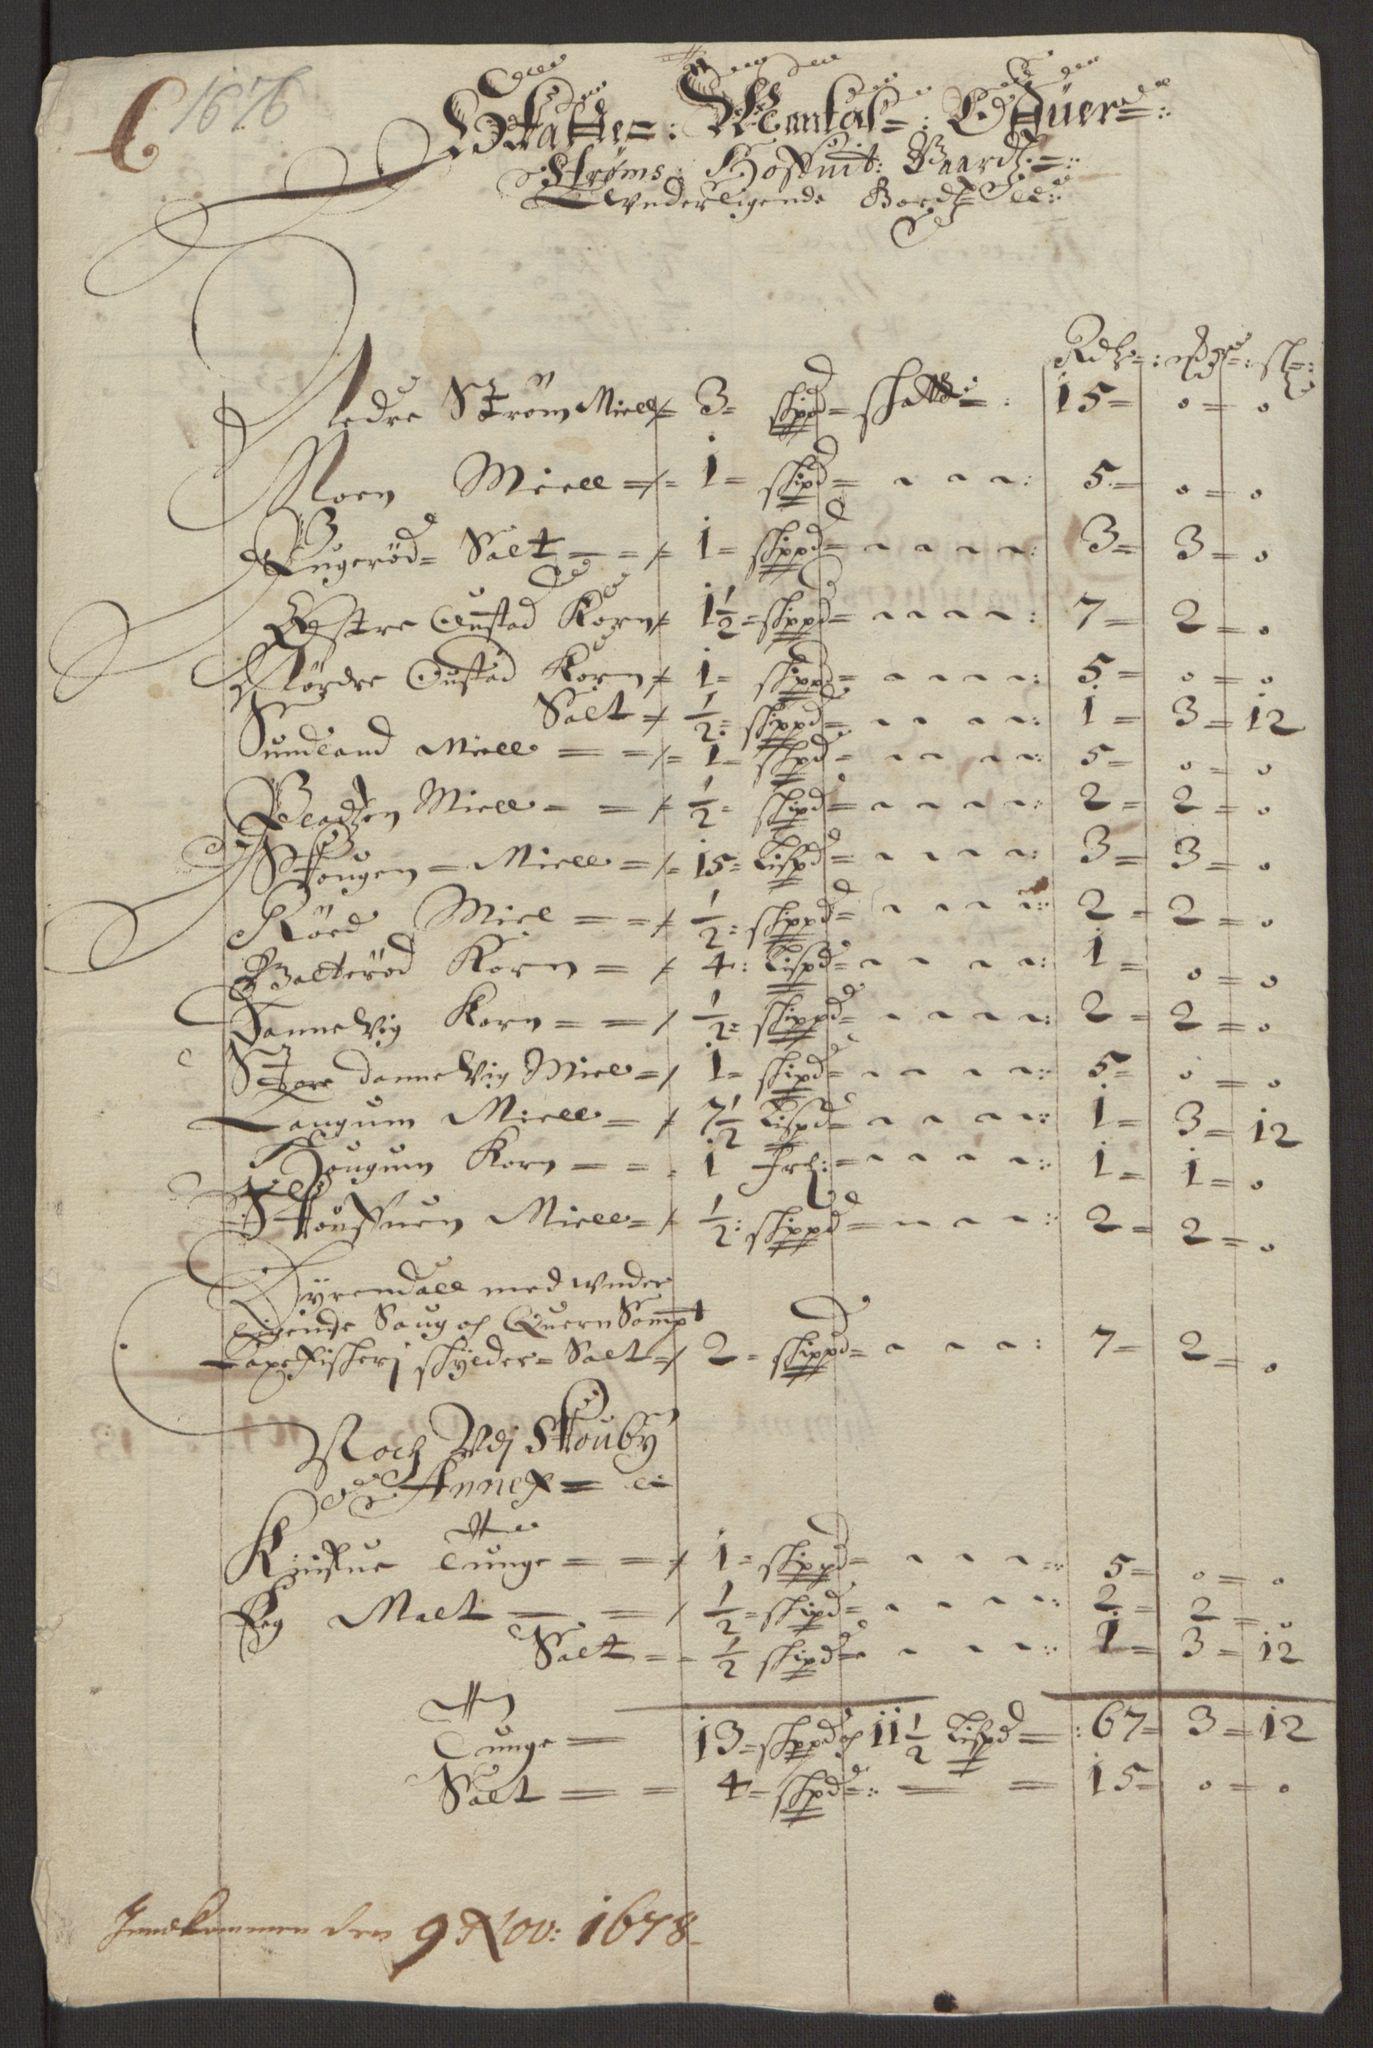 RA, Rentekammeret inntil 1814, Reviderte regnskaper, Fogderegnskap, R32/L1844: Fogderegnskap Jarlsberg grevskap, 1674-1675, s. 413